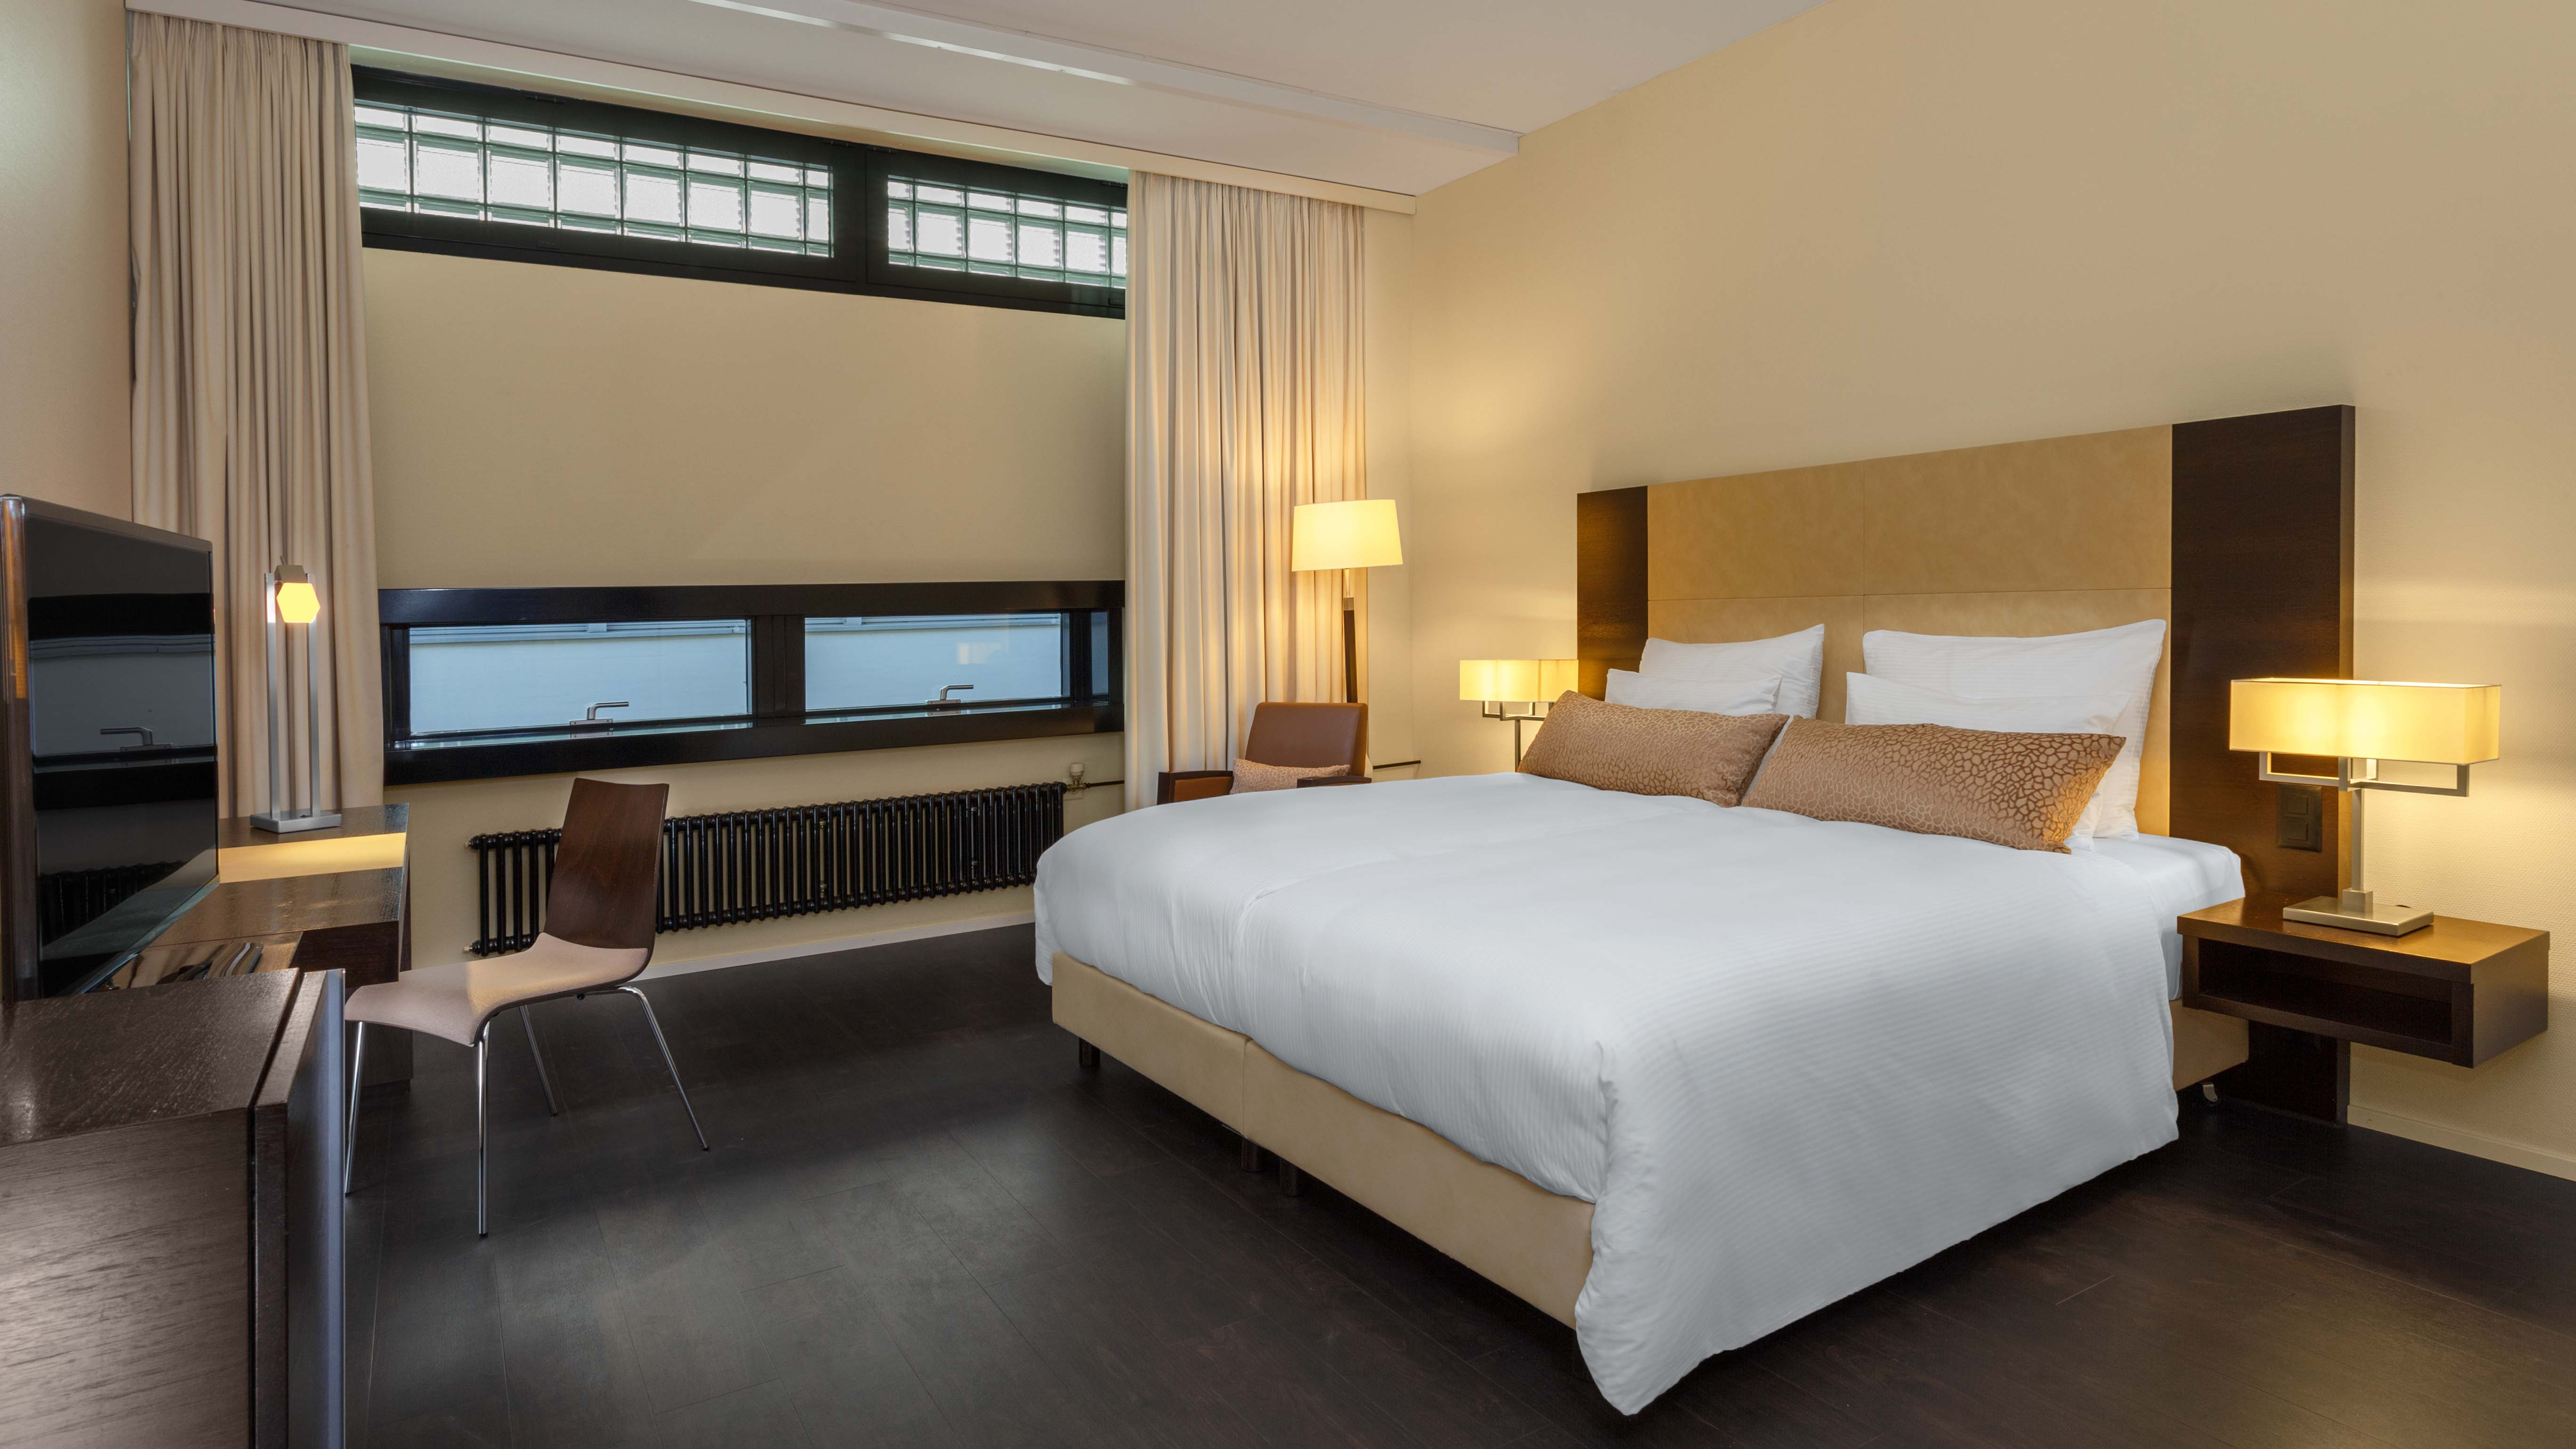 https://www.hotelsbyday.com/_data/default-hotel_image/2/12992/zrhfp-accesible-bed-room.jpg